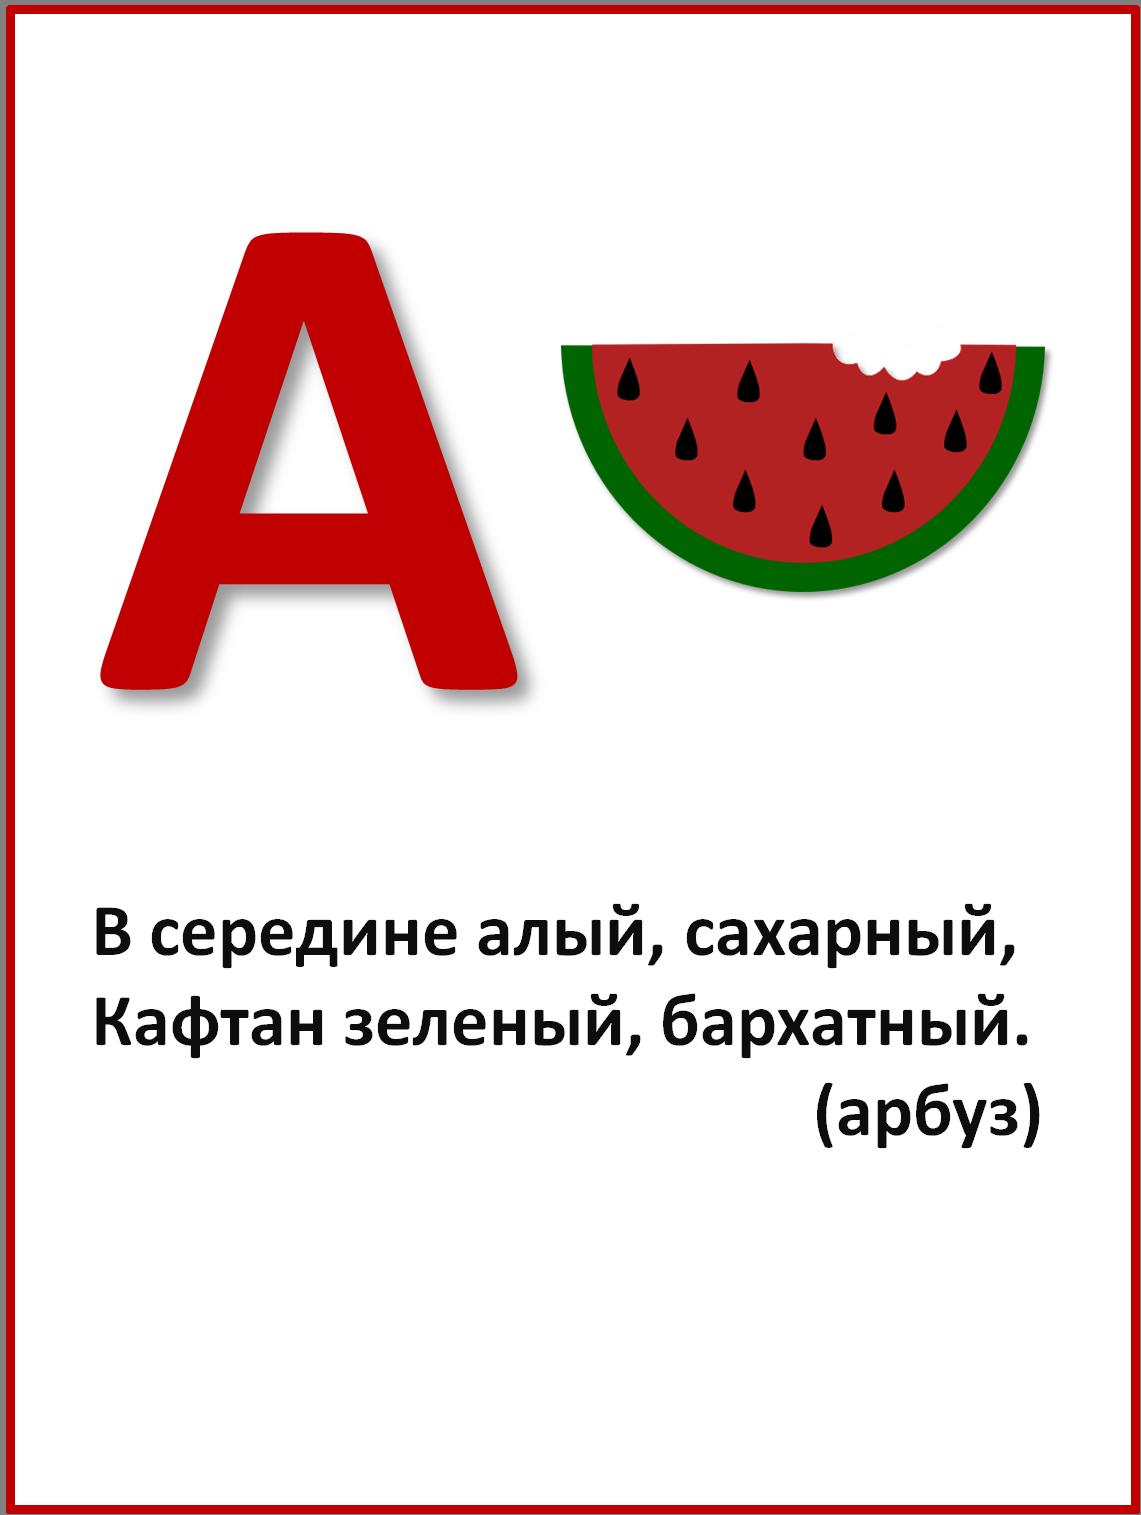 Проект на тему алфавит для 1 класса своими руками фото 403